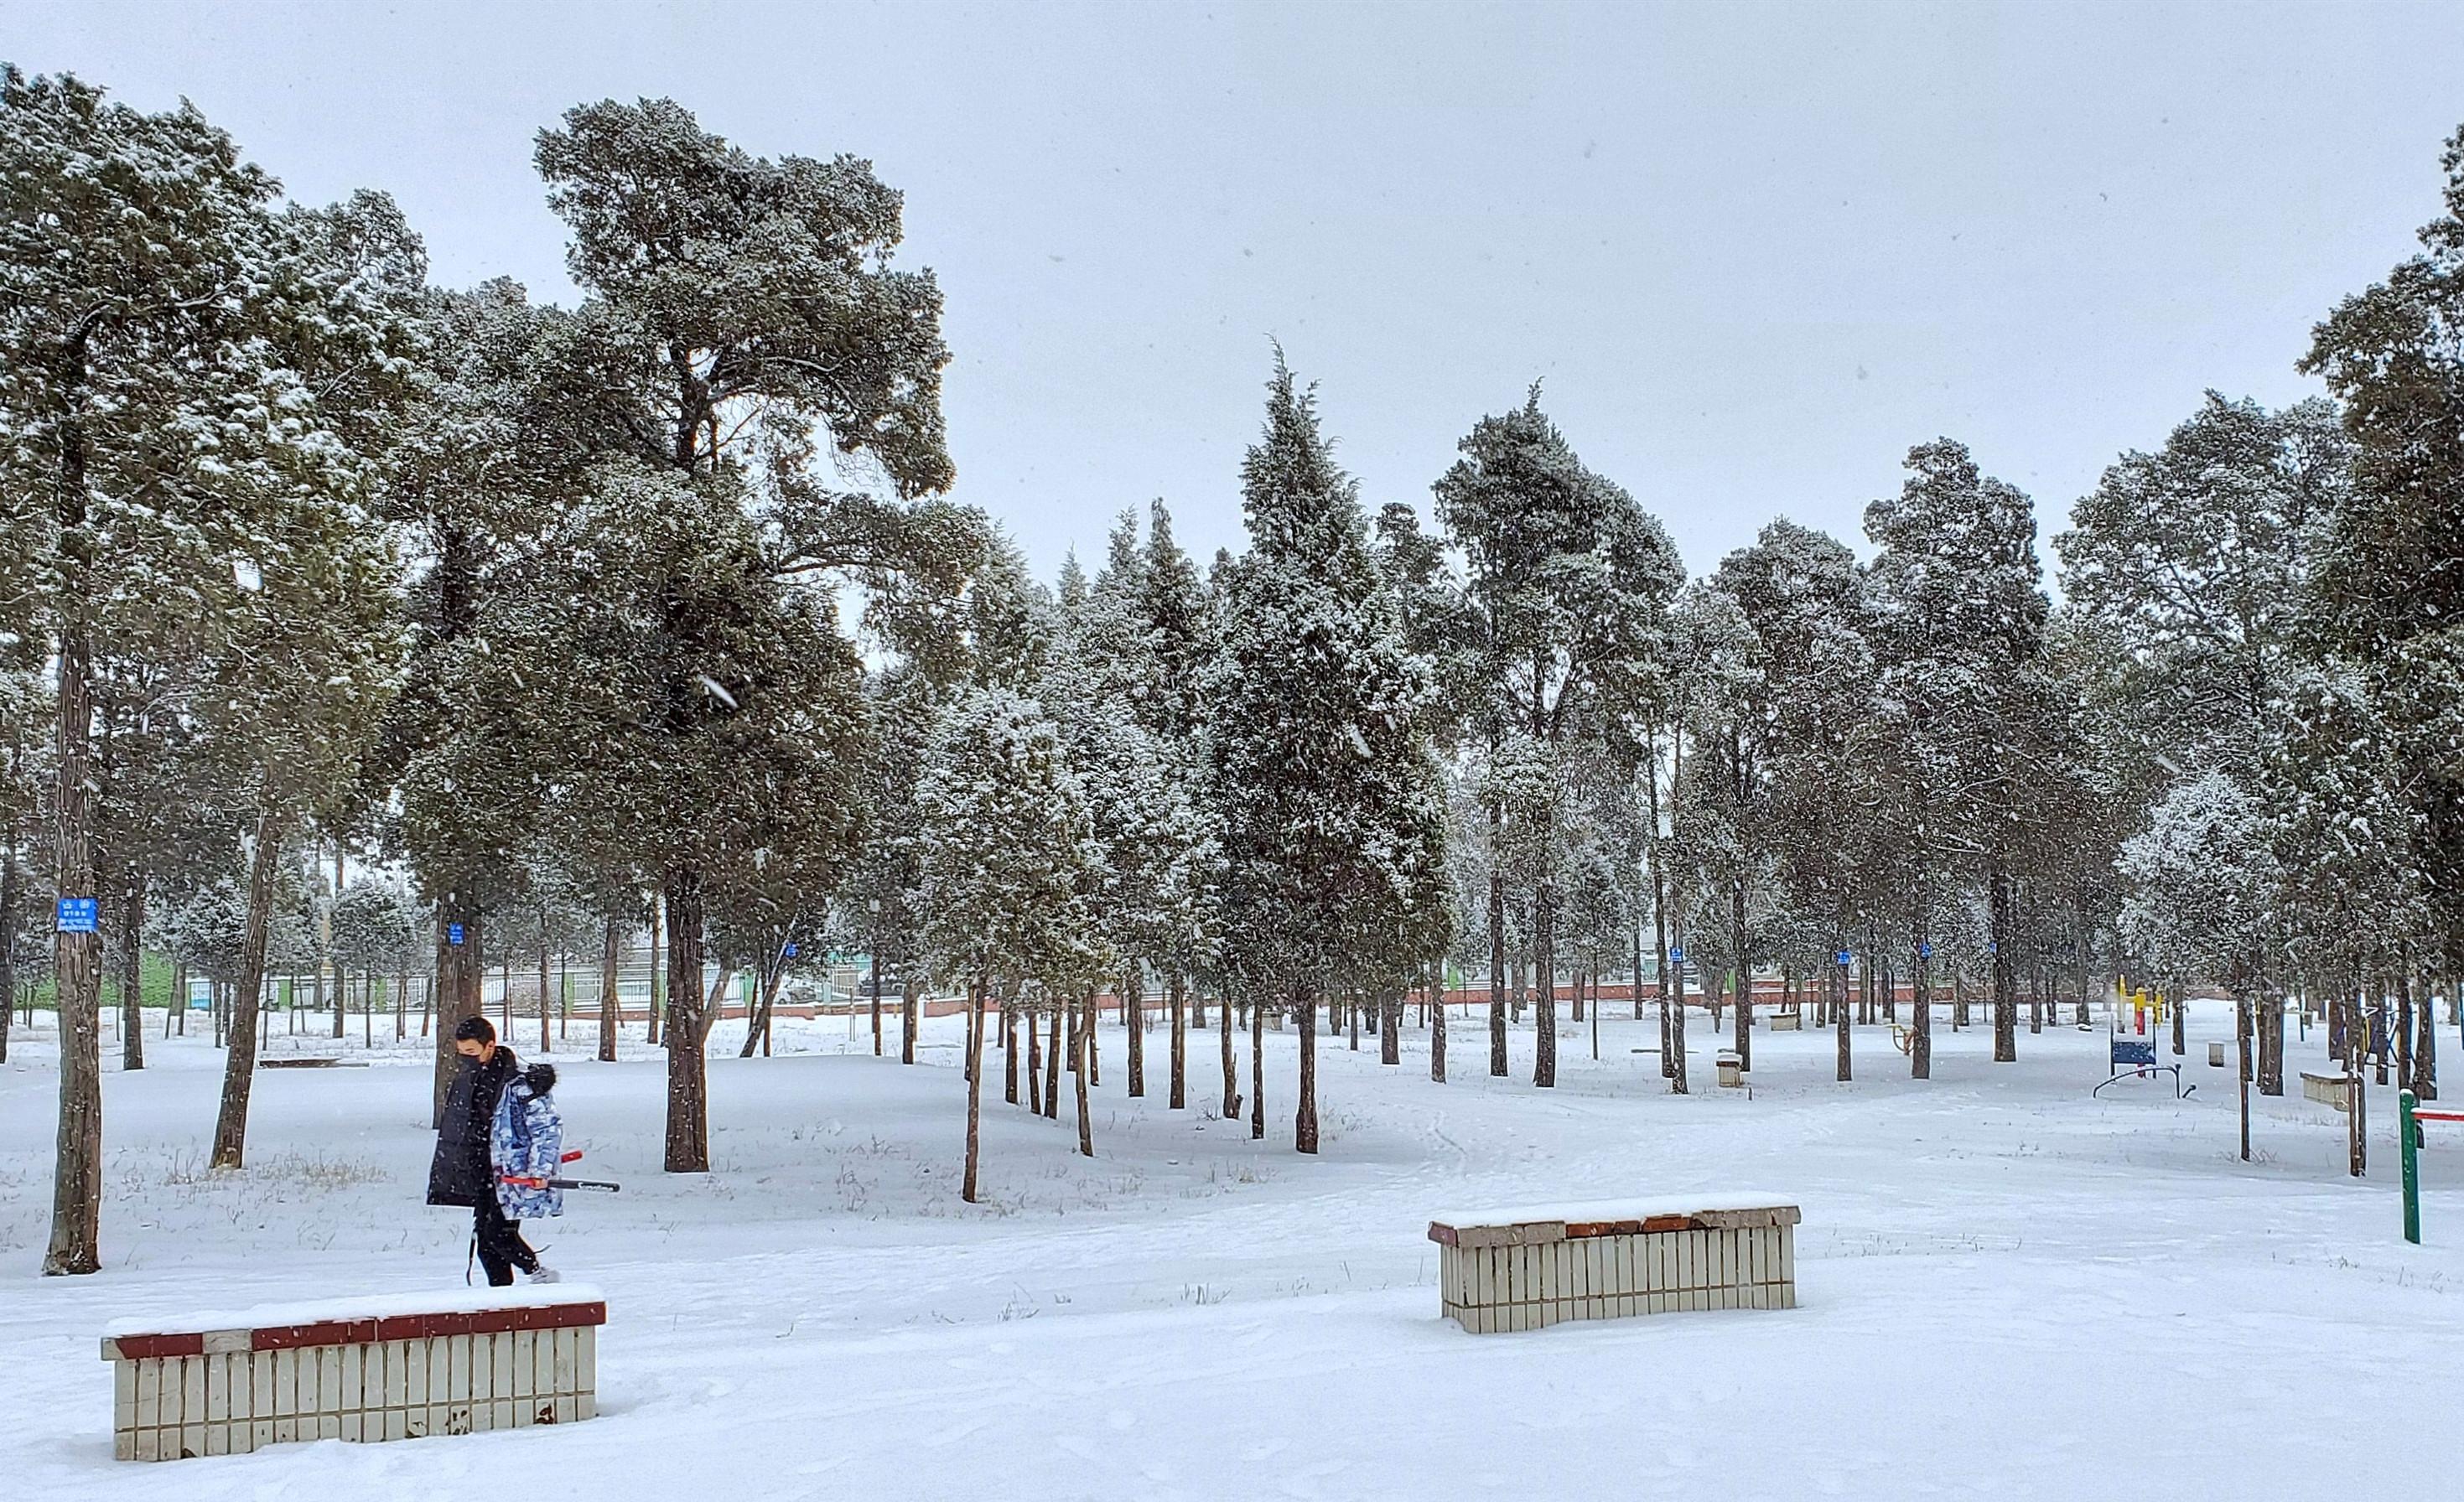 GalaxyS10+ 春雪(一)